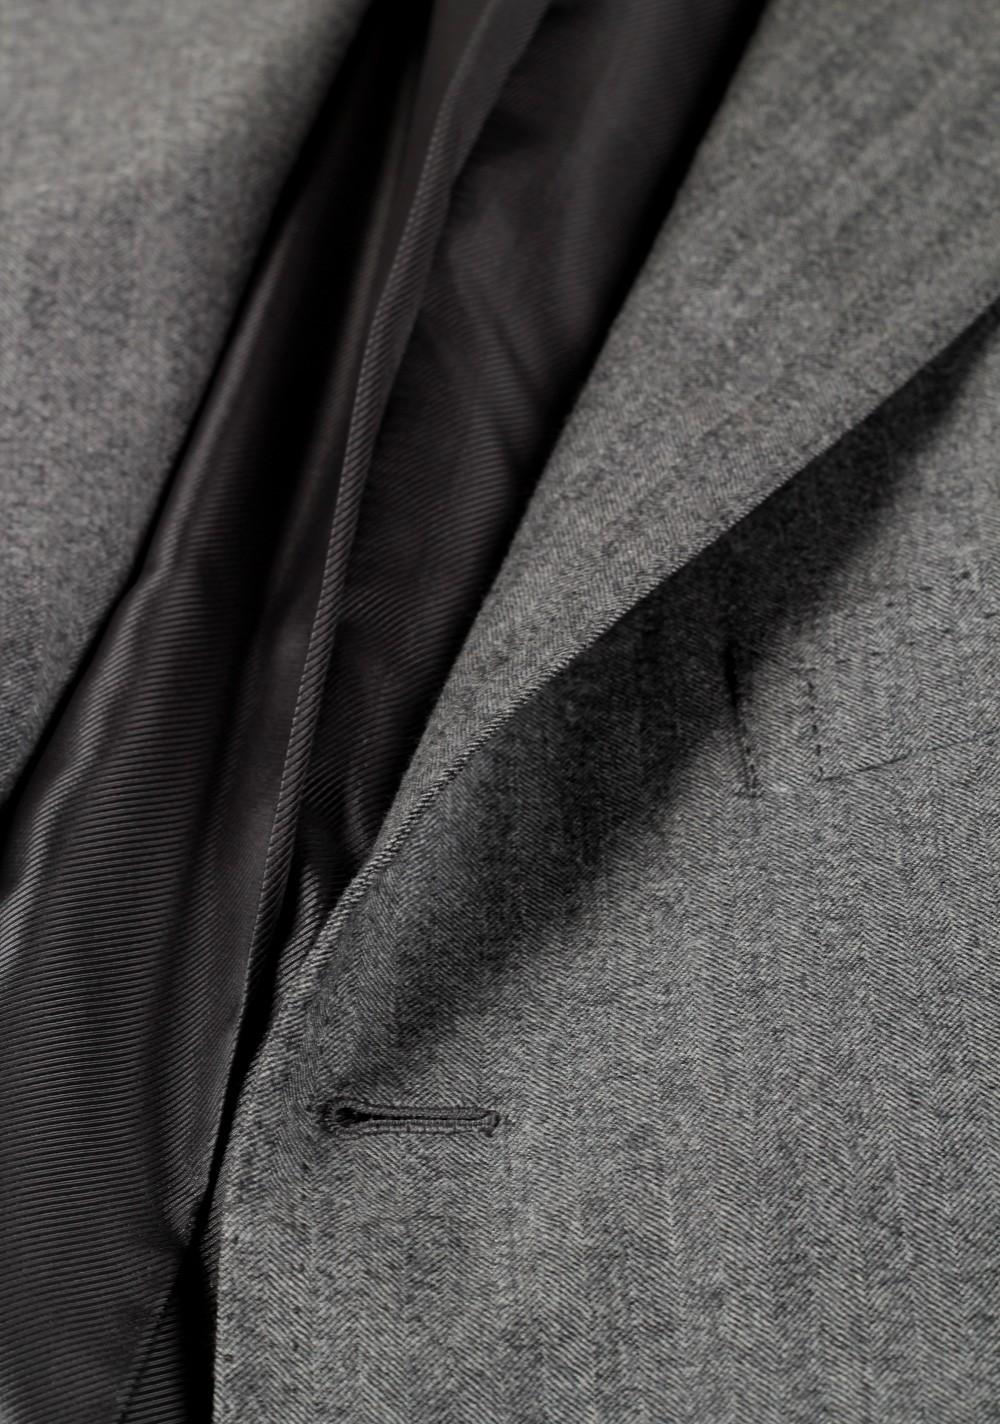 Attolini Sport Coat Size 42 / 42R U.S. | Costume Limité